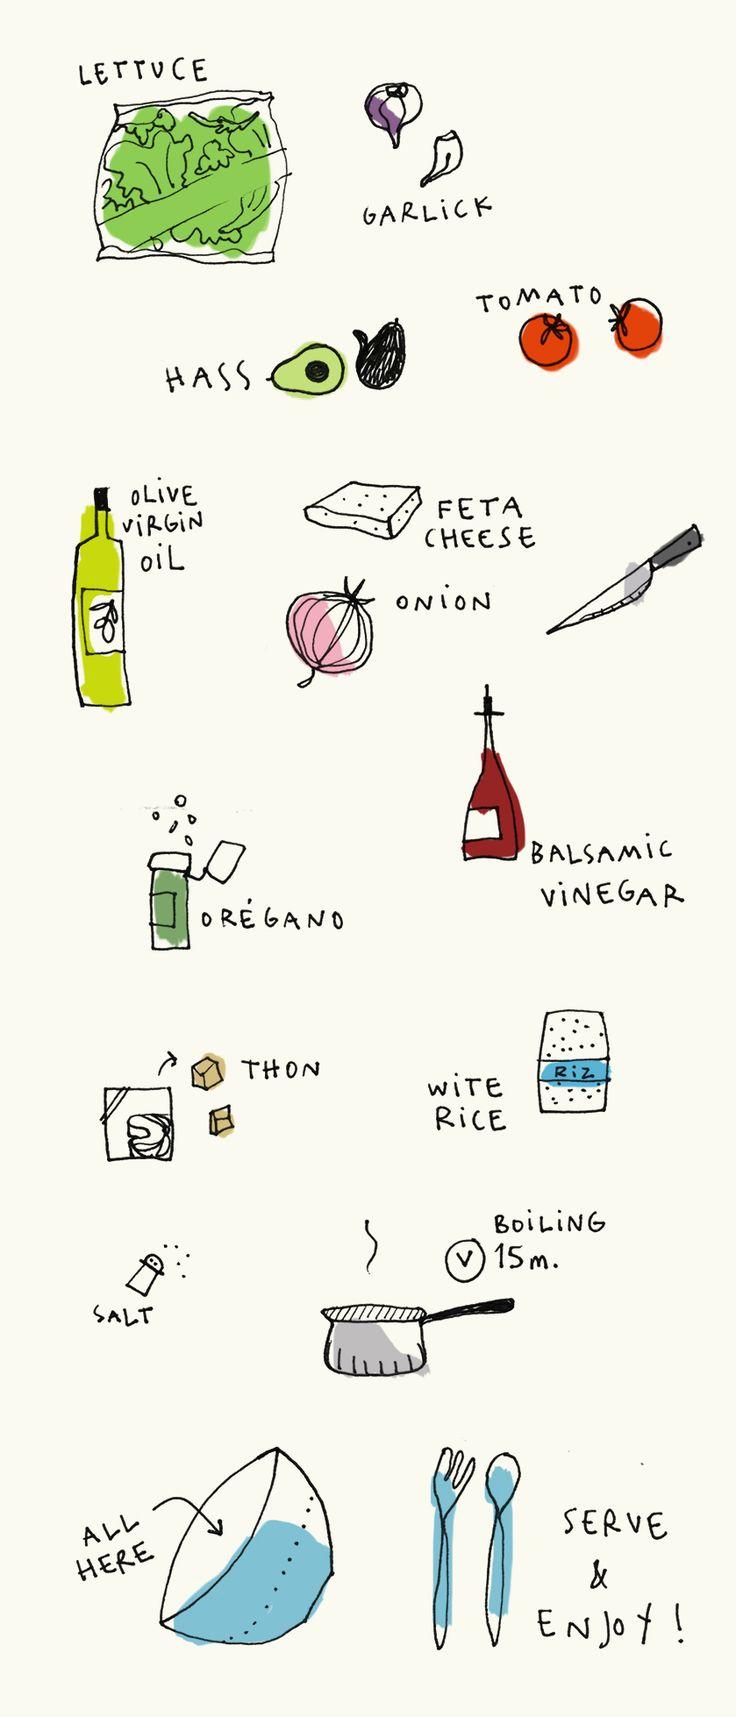 indie salad mercedes leon illustration recipe